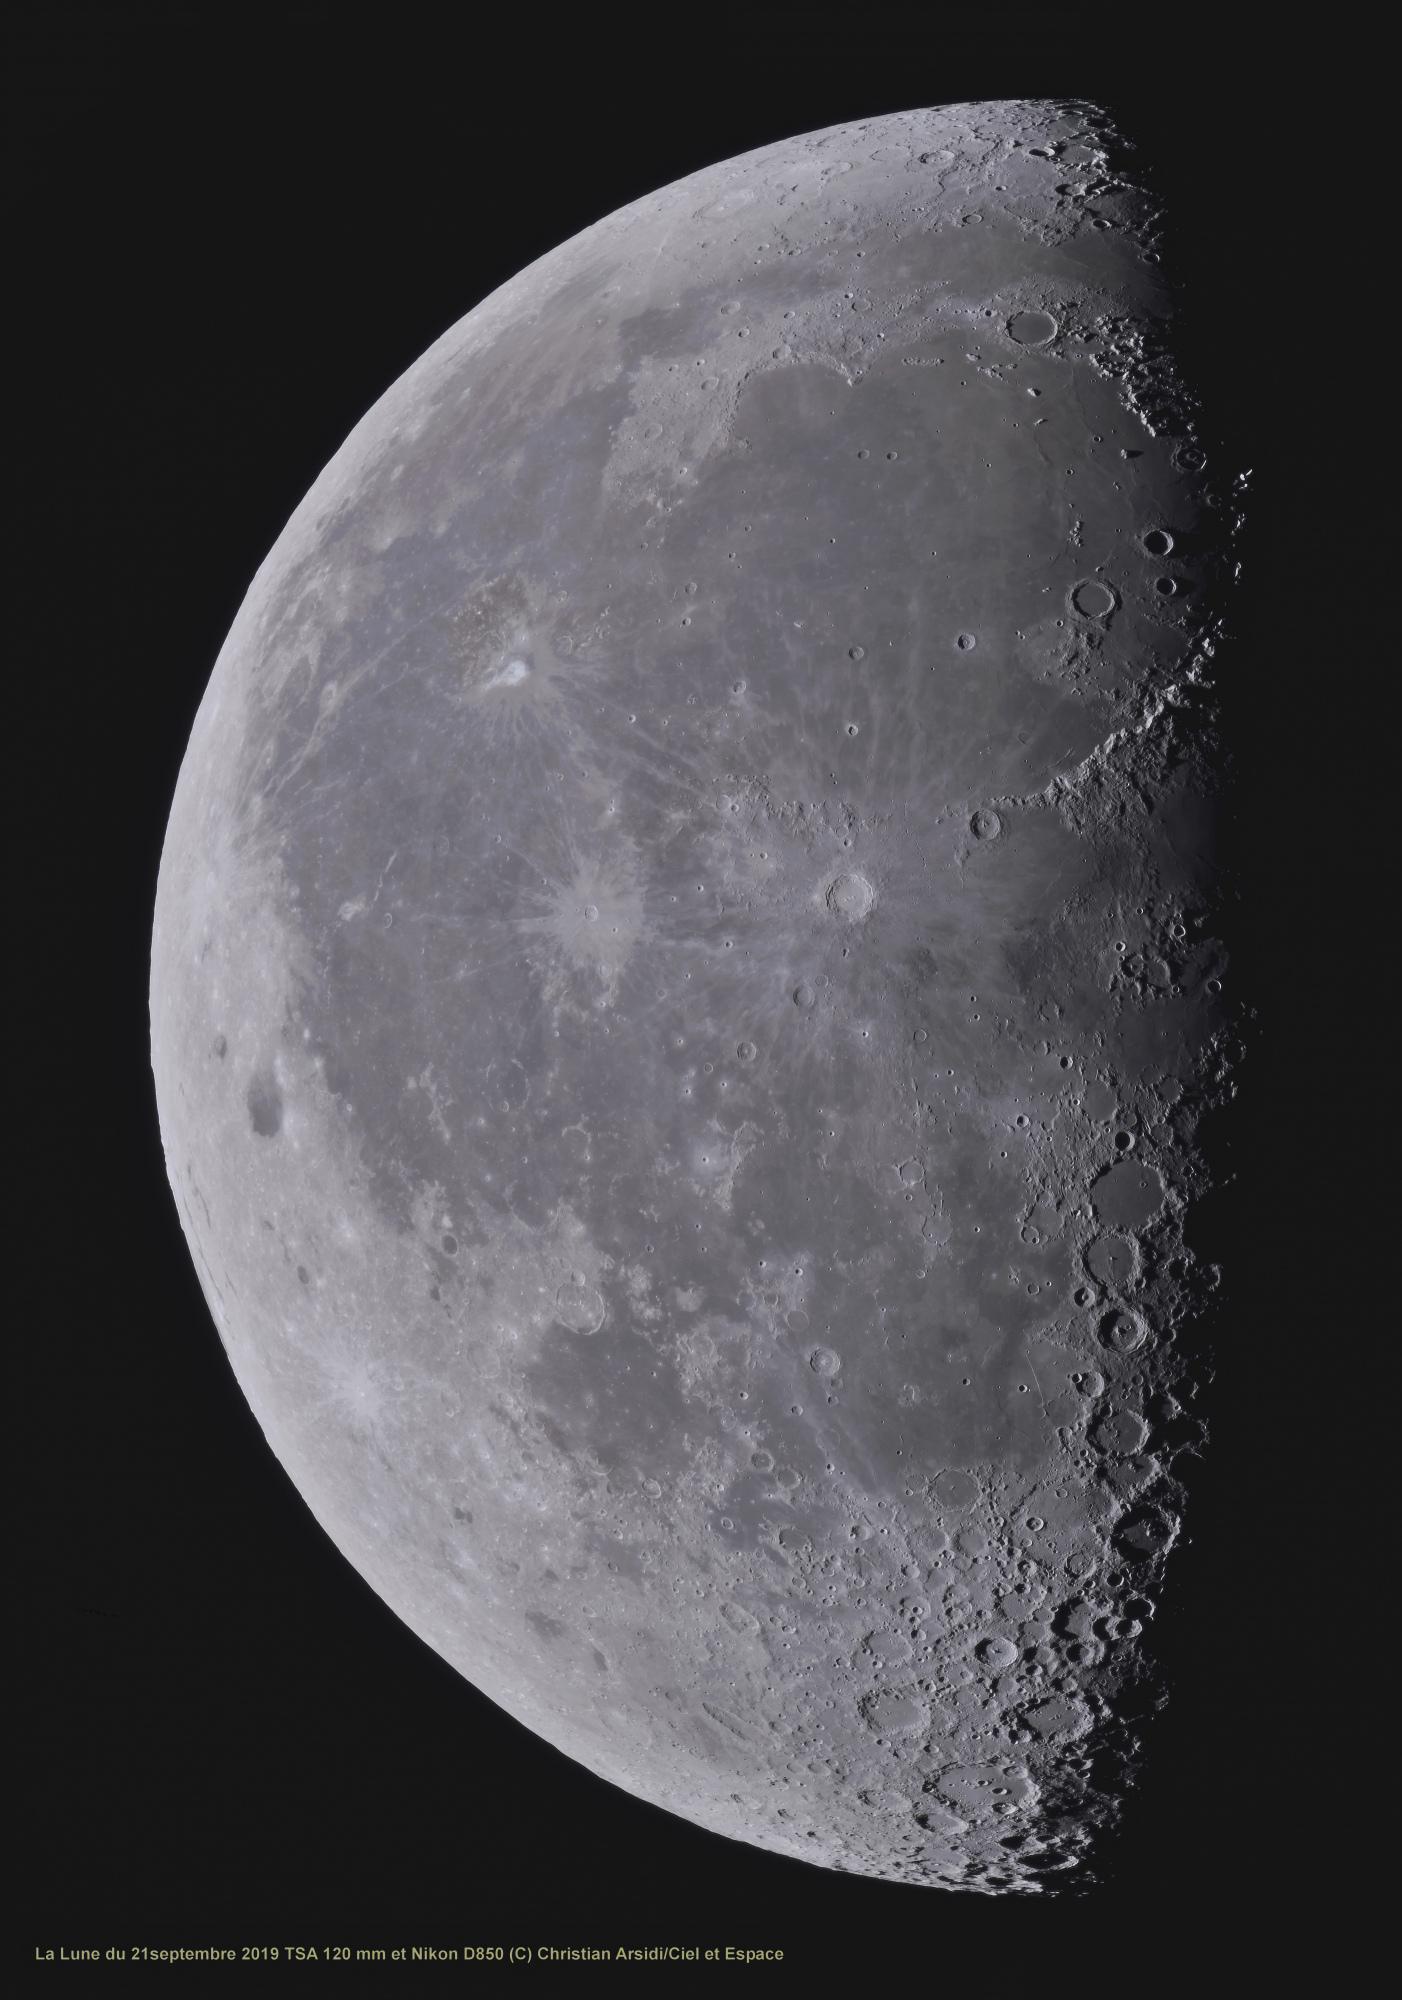 La Lune 30  images 100% TTB BV 2 JPEG 5.5 Mo MO.jpg